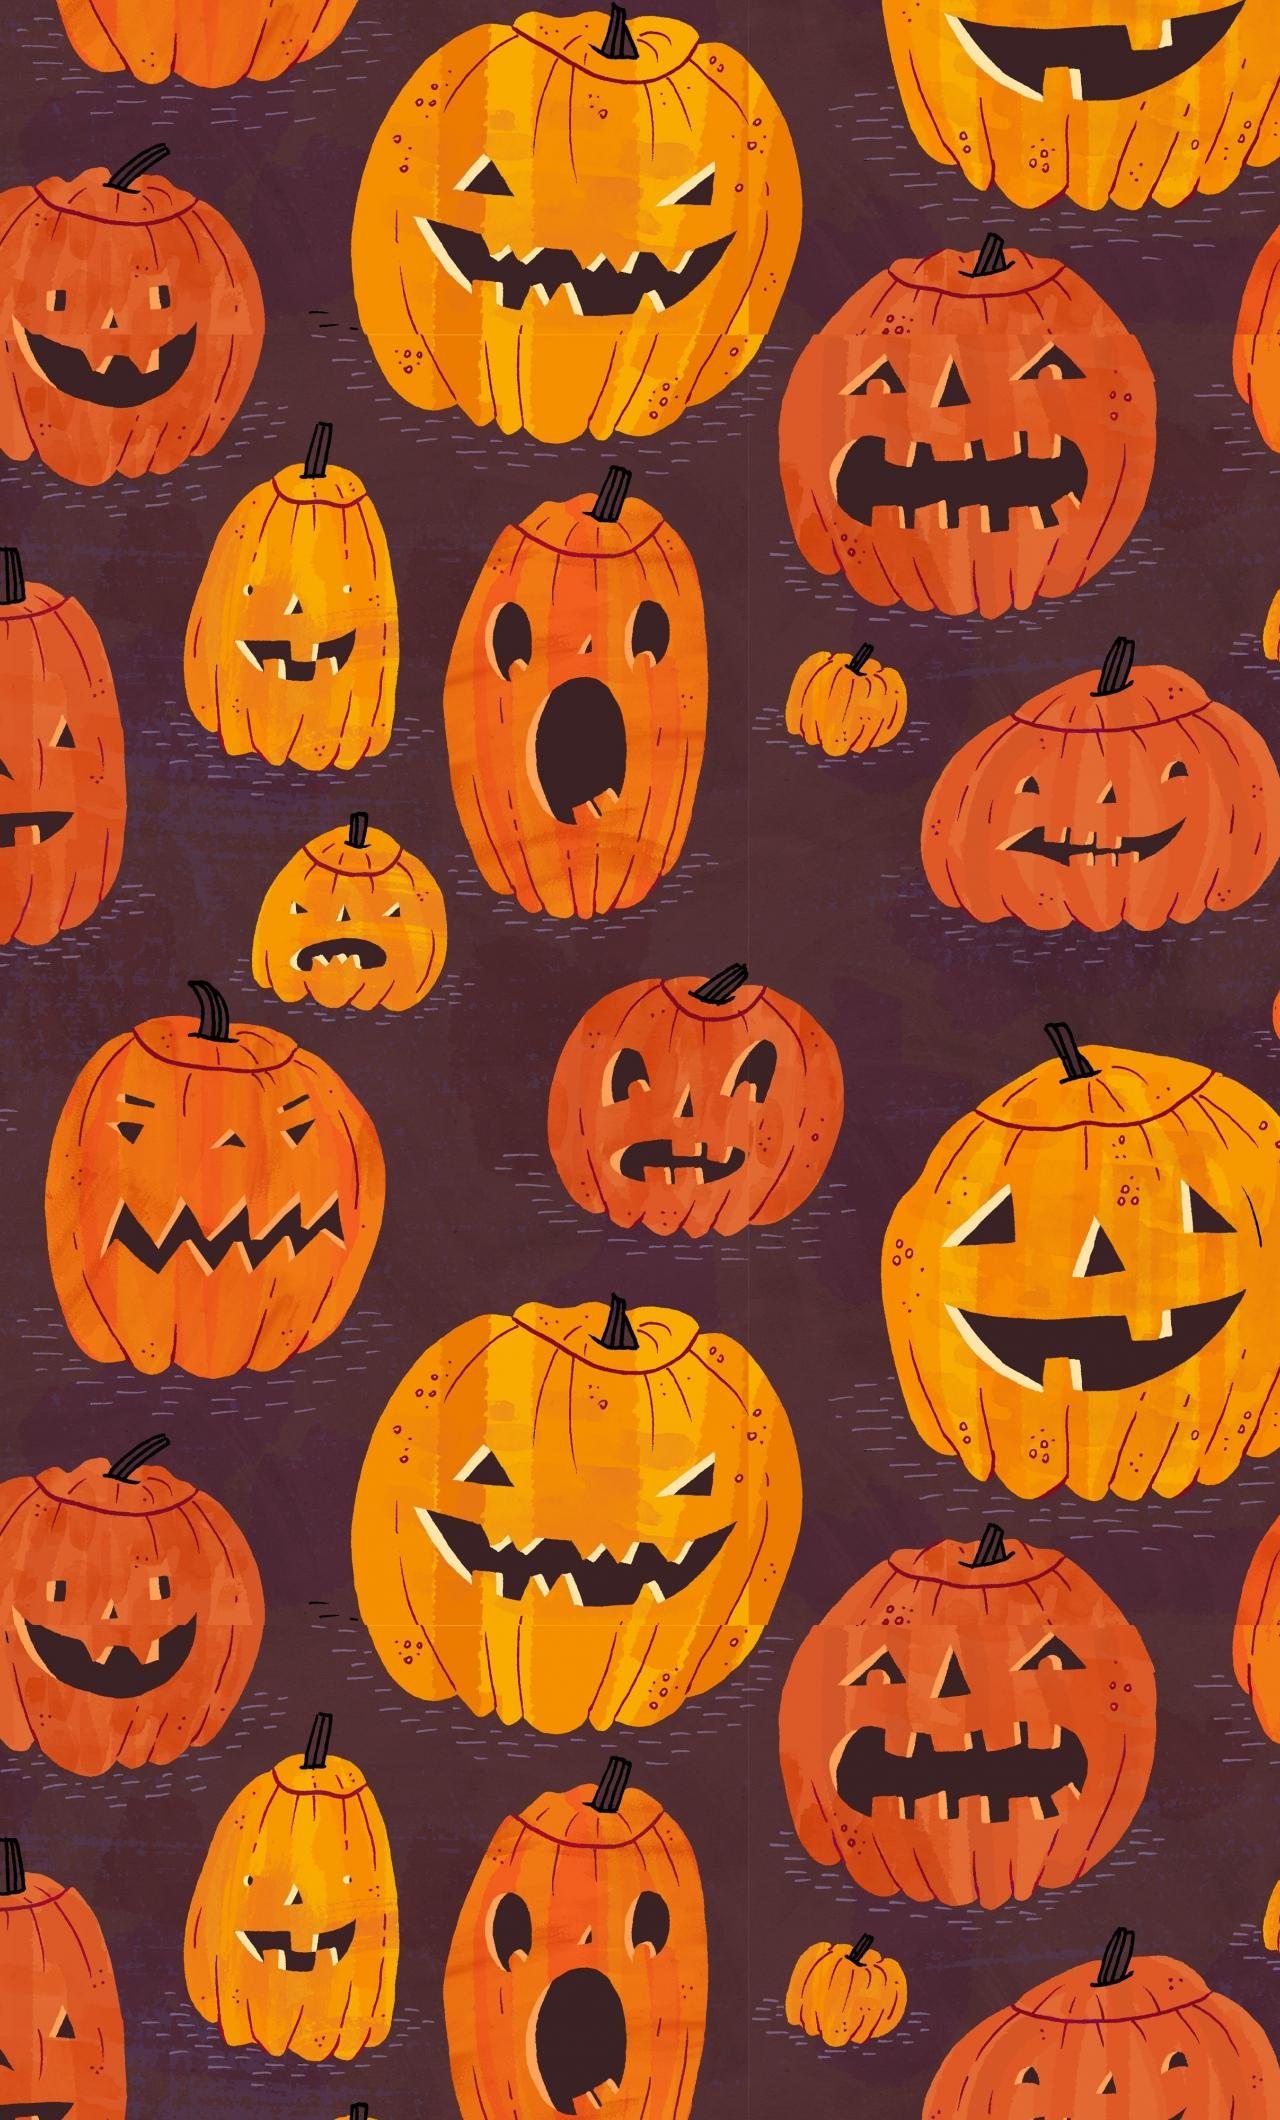 Download 1280x2120 Wallpaper Pumpkin Pattern Halloween Iphone 6